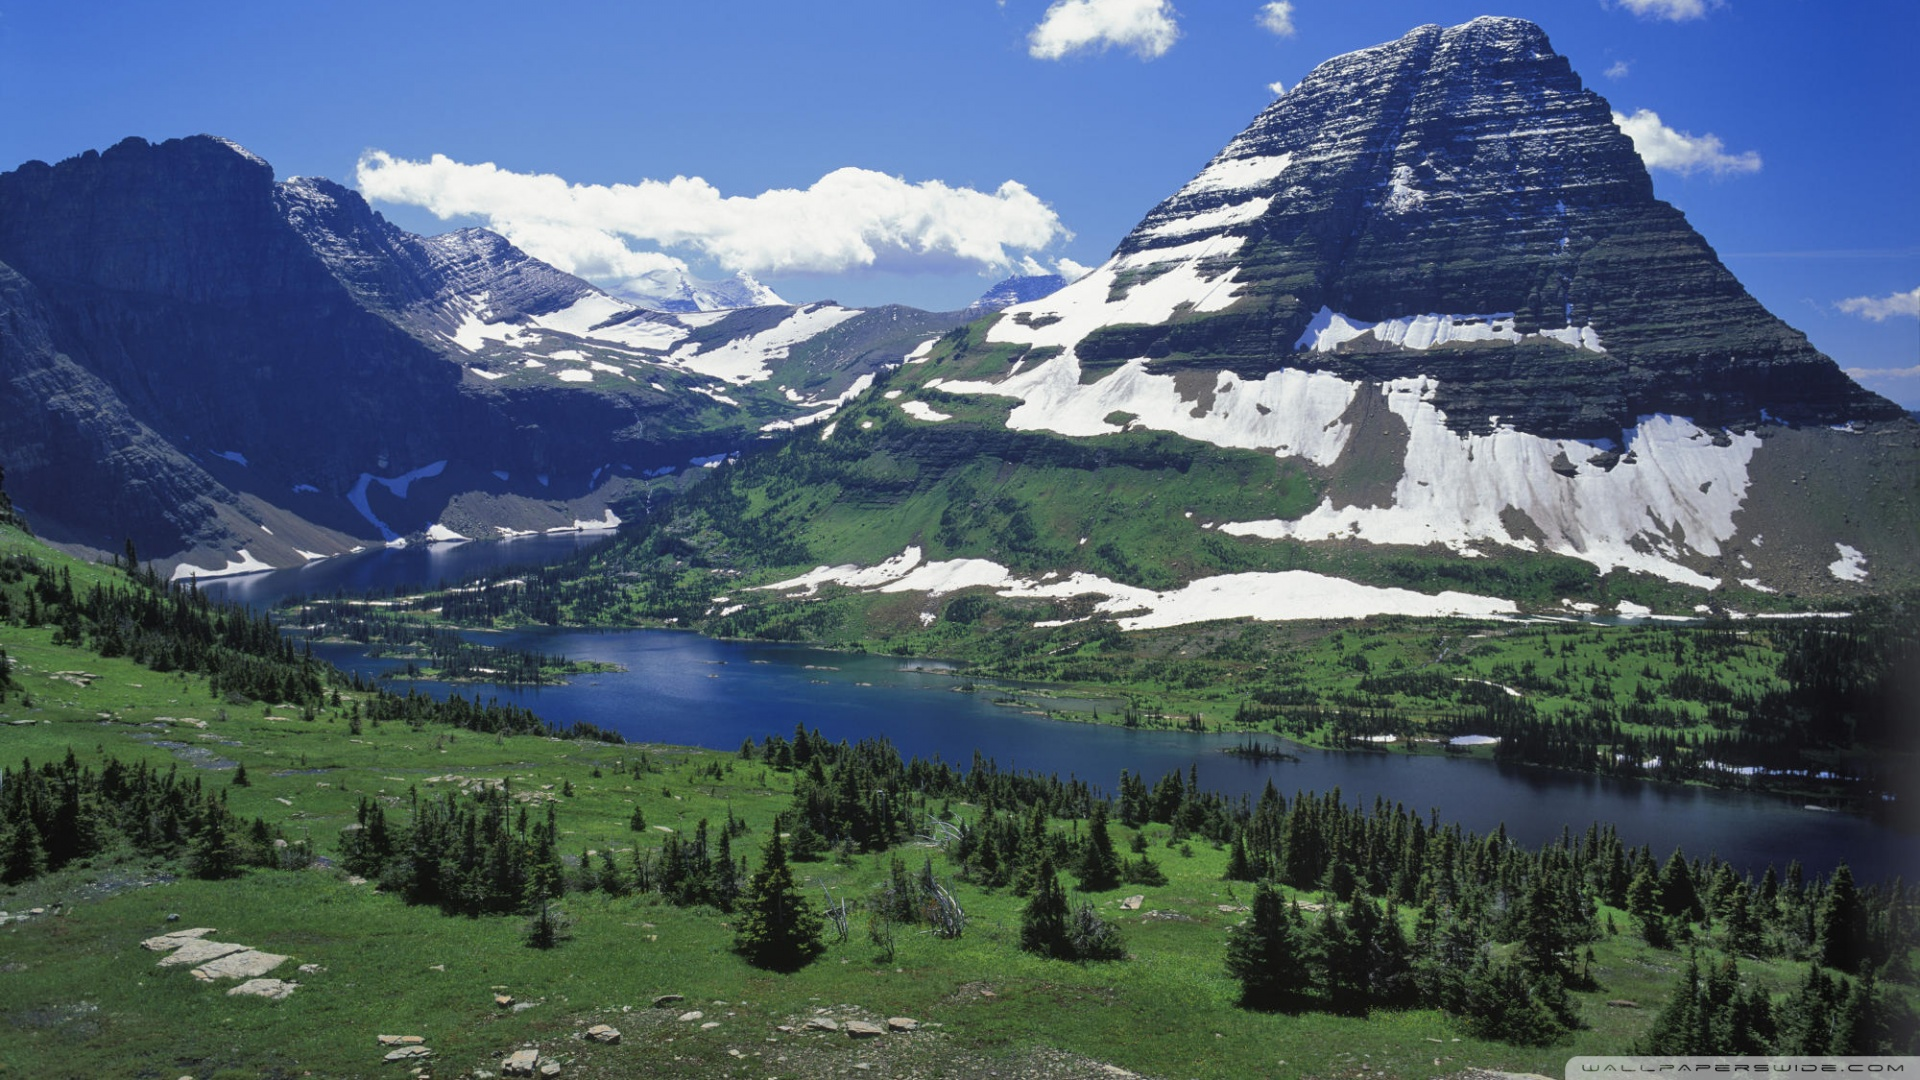 Park Montana Wallpaper 1920x1080 Hidden Lake Glacier National Park 1920x1080